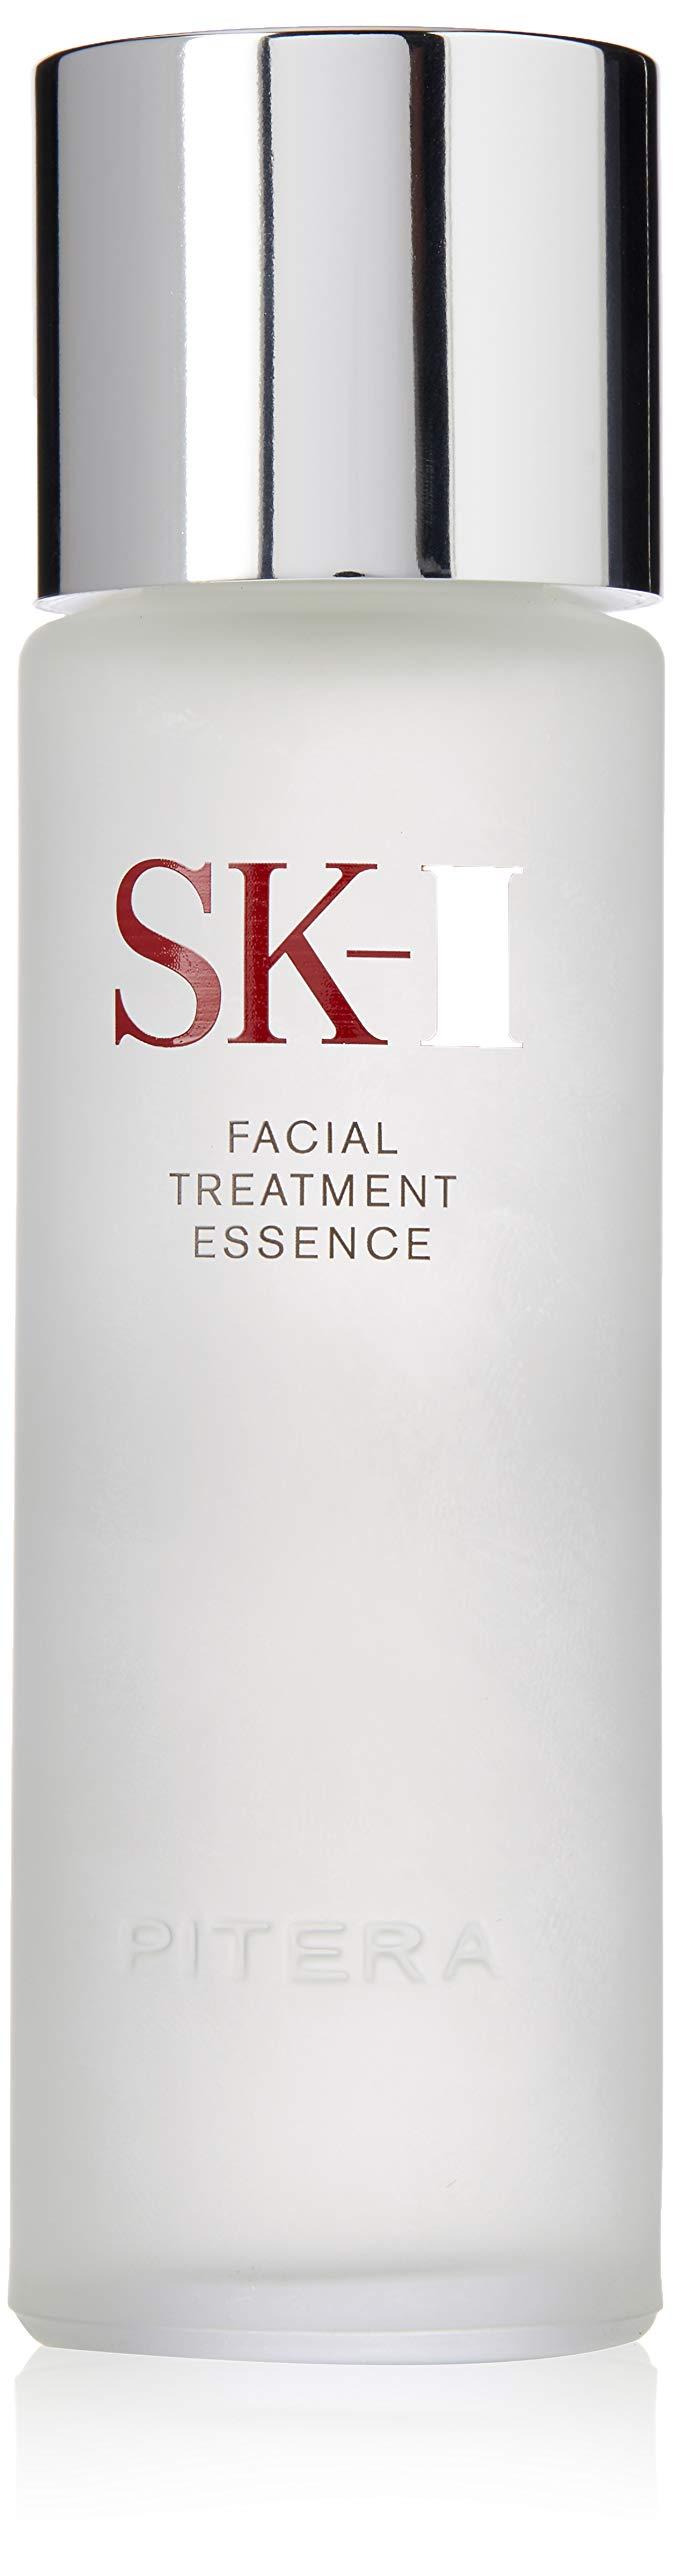 SK-II Facial Treatment Essence, 2.5 Ounce